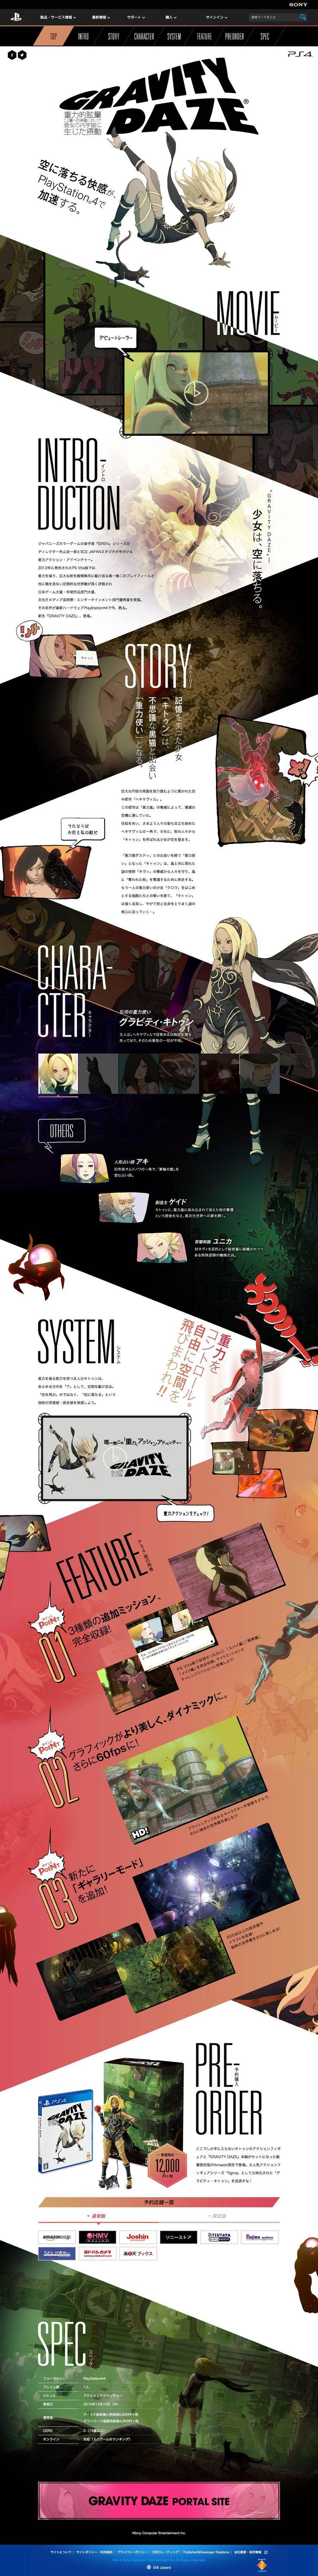 http://www.jp.playstation.com/scej/title/gravitydaze/ps4/